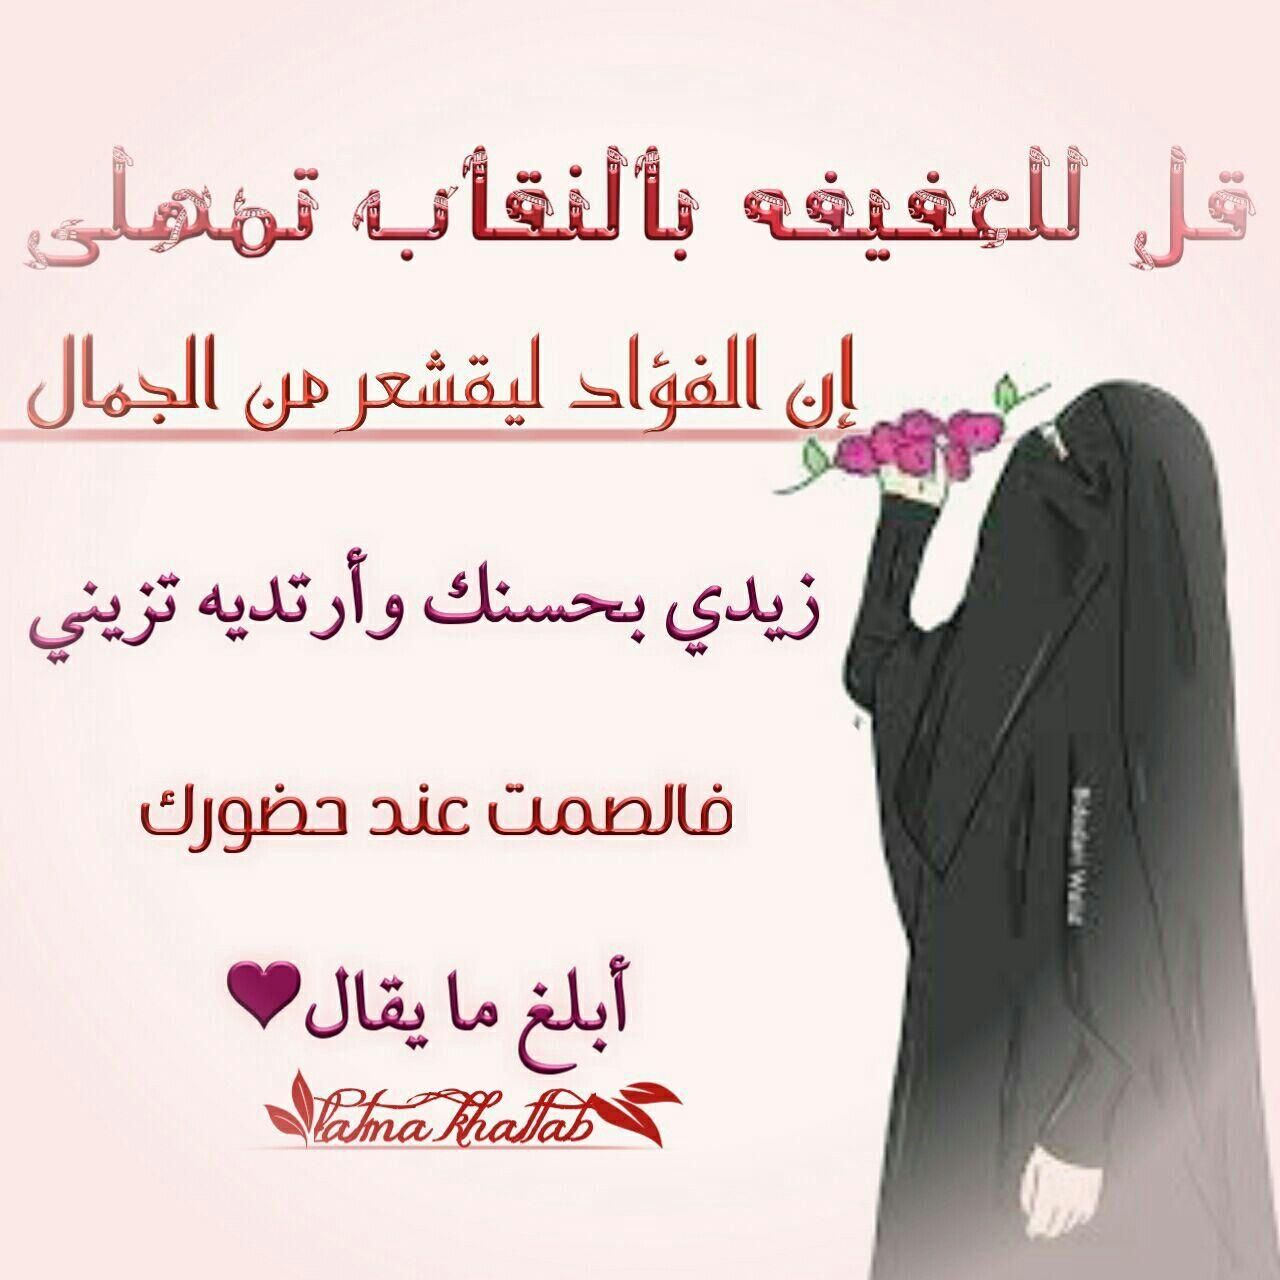 قل للعفيفة بالنقاب تمهلي Words Niqab Qoutes